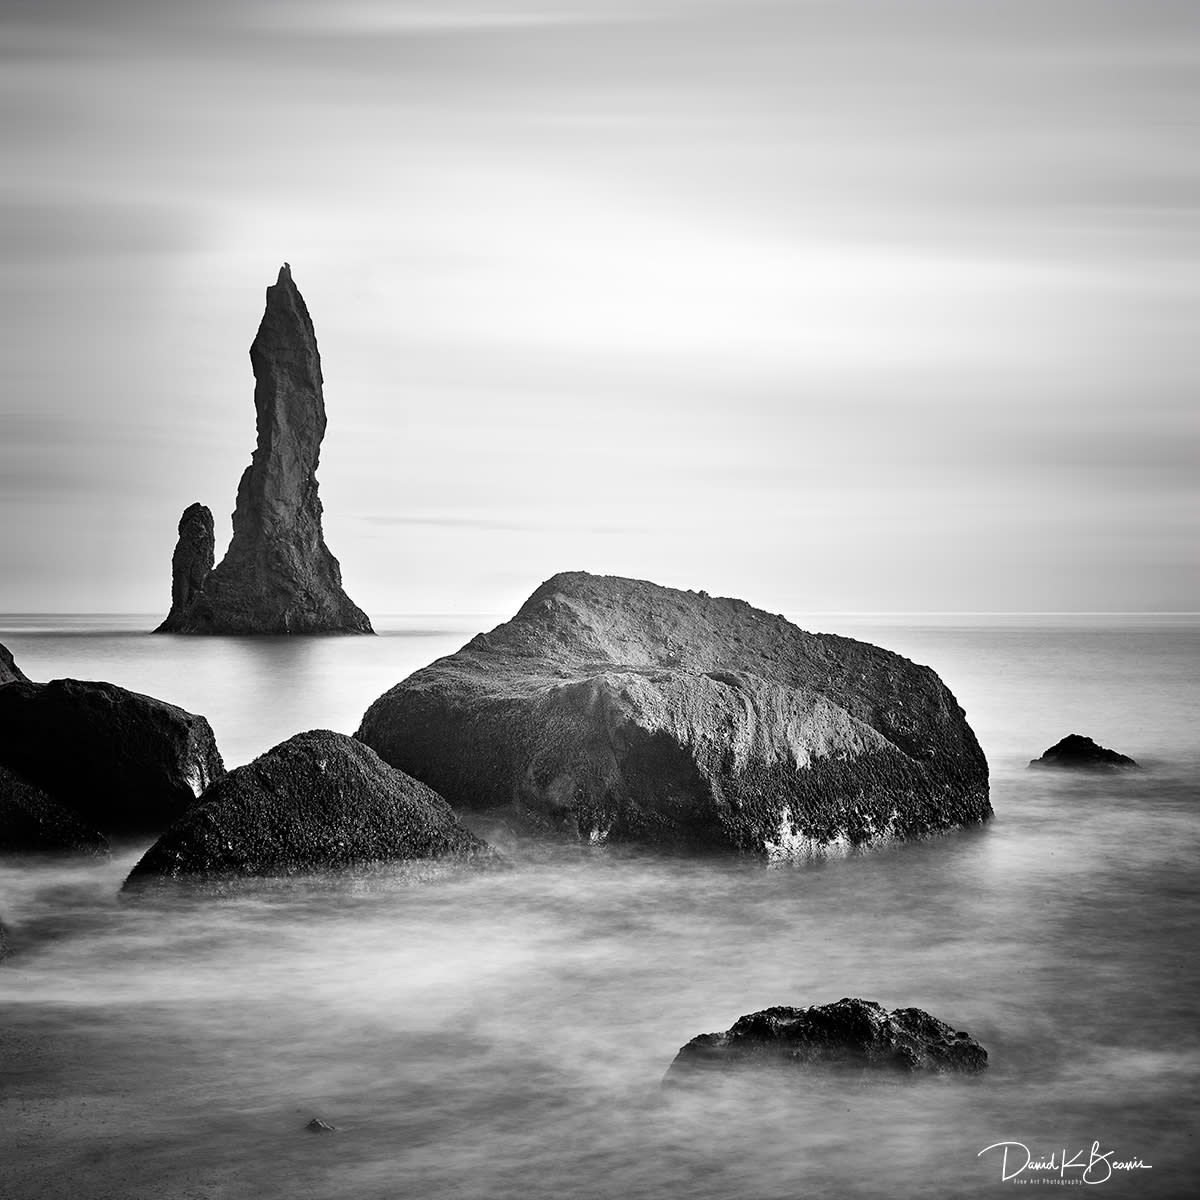 Iceland beach stack ysmzys tj7lrm